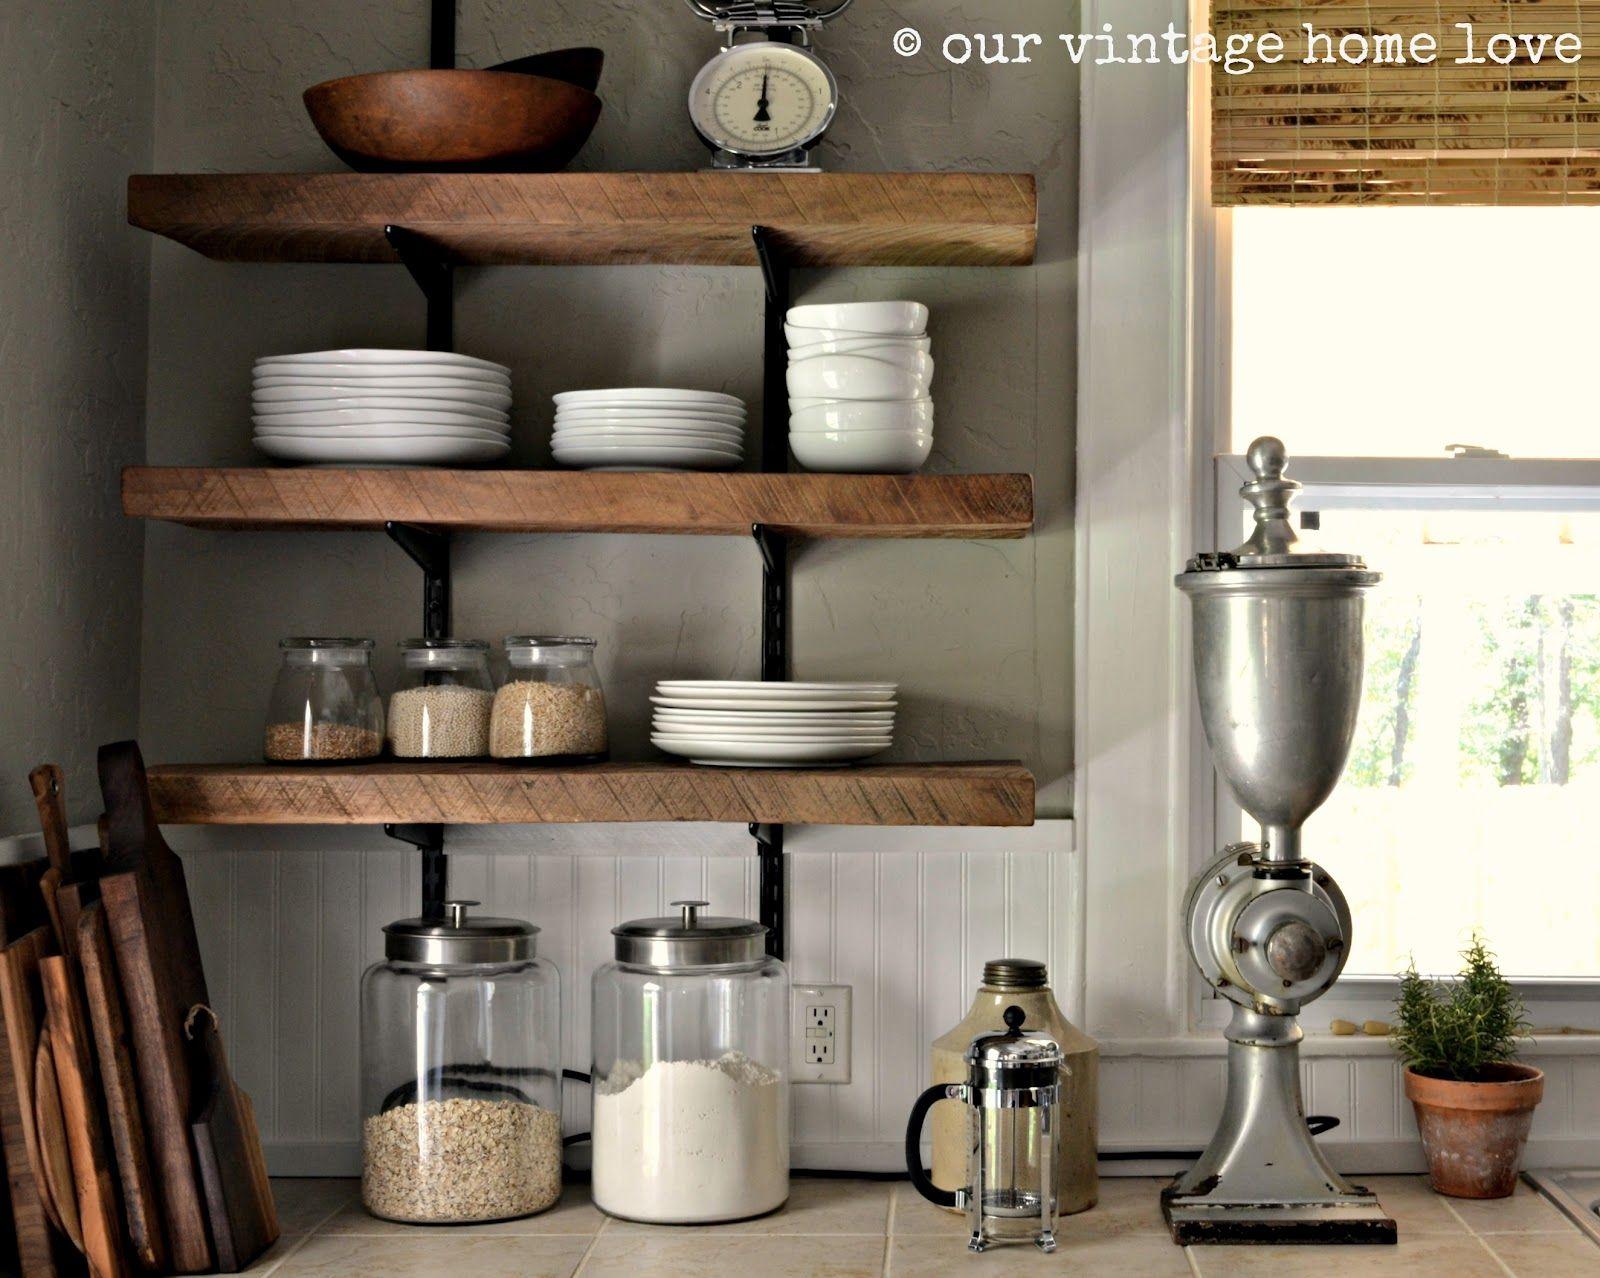 Large Glass Jar Tabletops Pics Rustic Shelving Open Kitchen